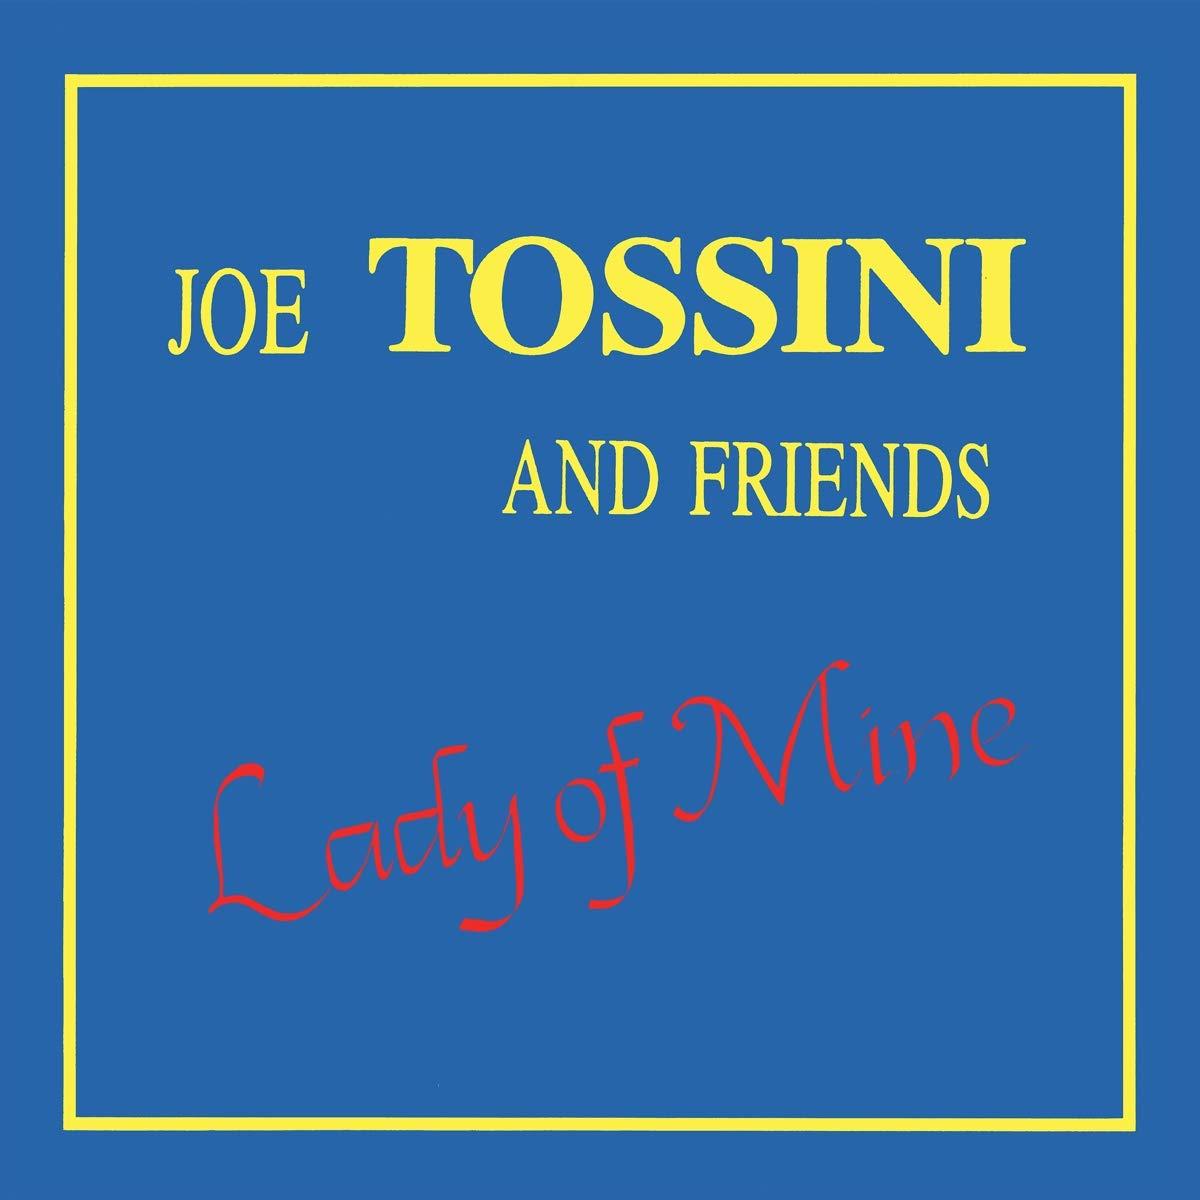 LADY OF MINE / Joe Tossini and friendsのジャケット